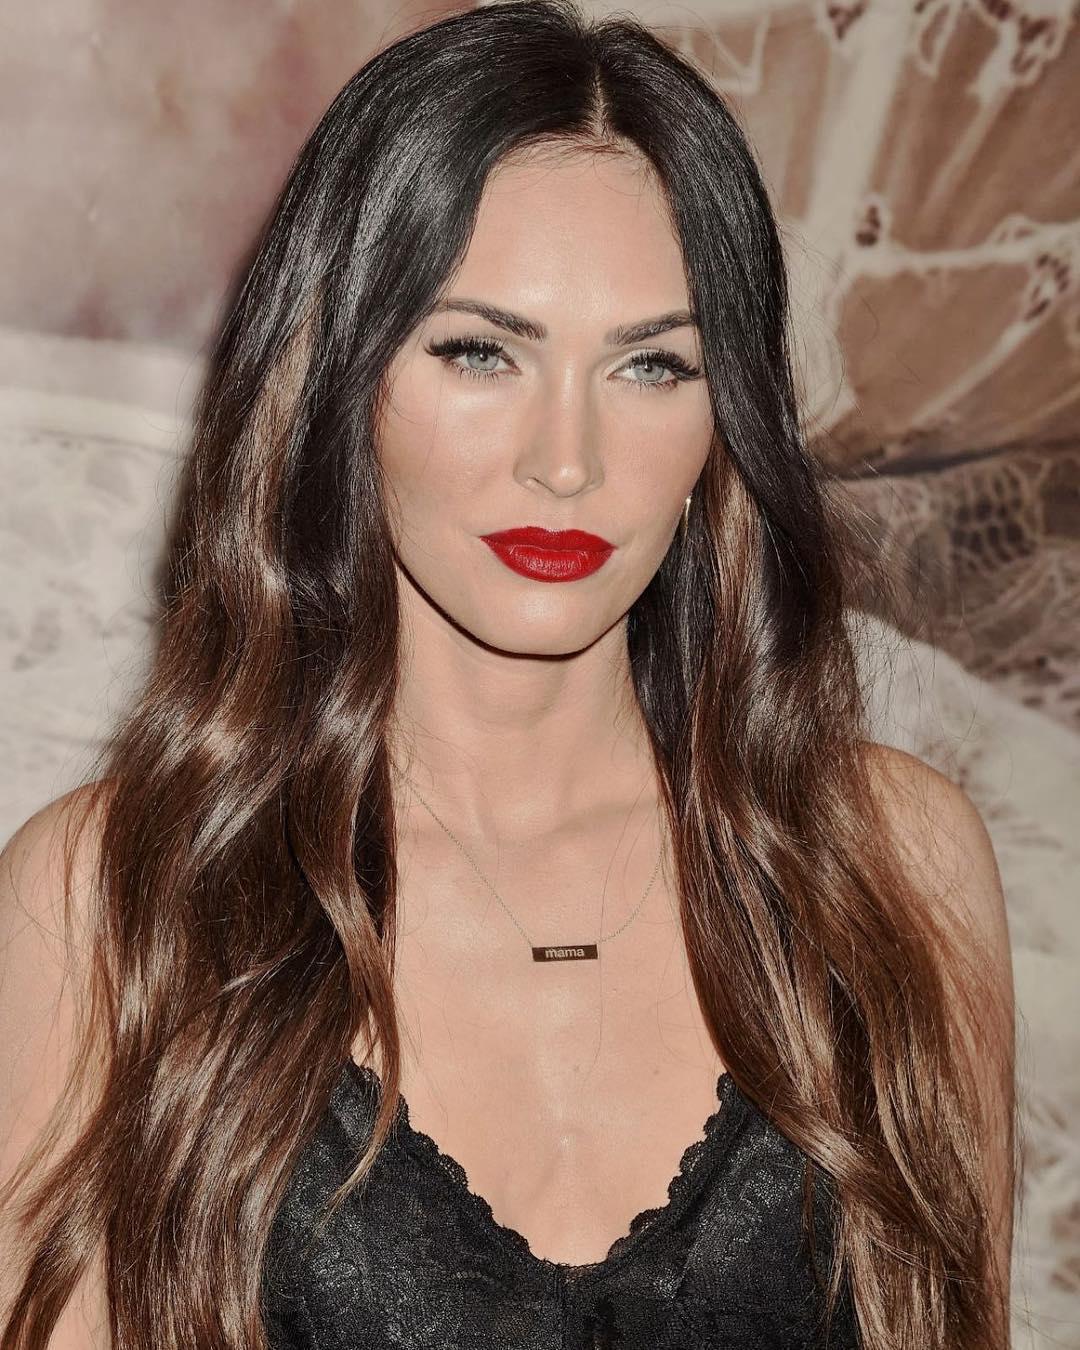 Megan Fox Photos | Megan Fox Hot | Megan Fox Pictures - HD Actress Photo